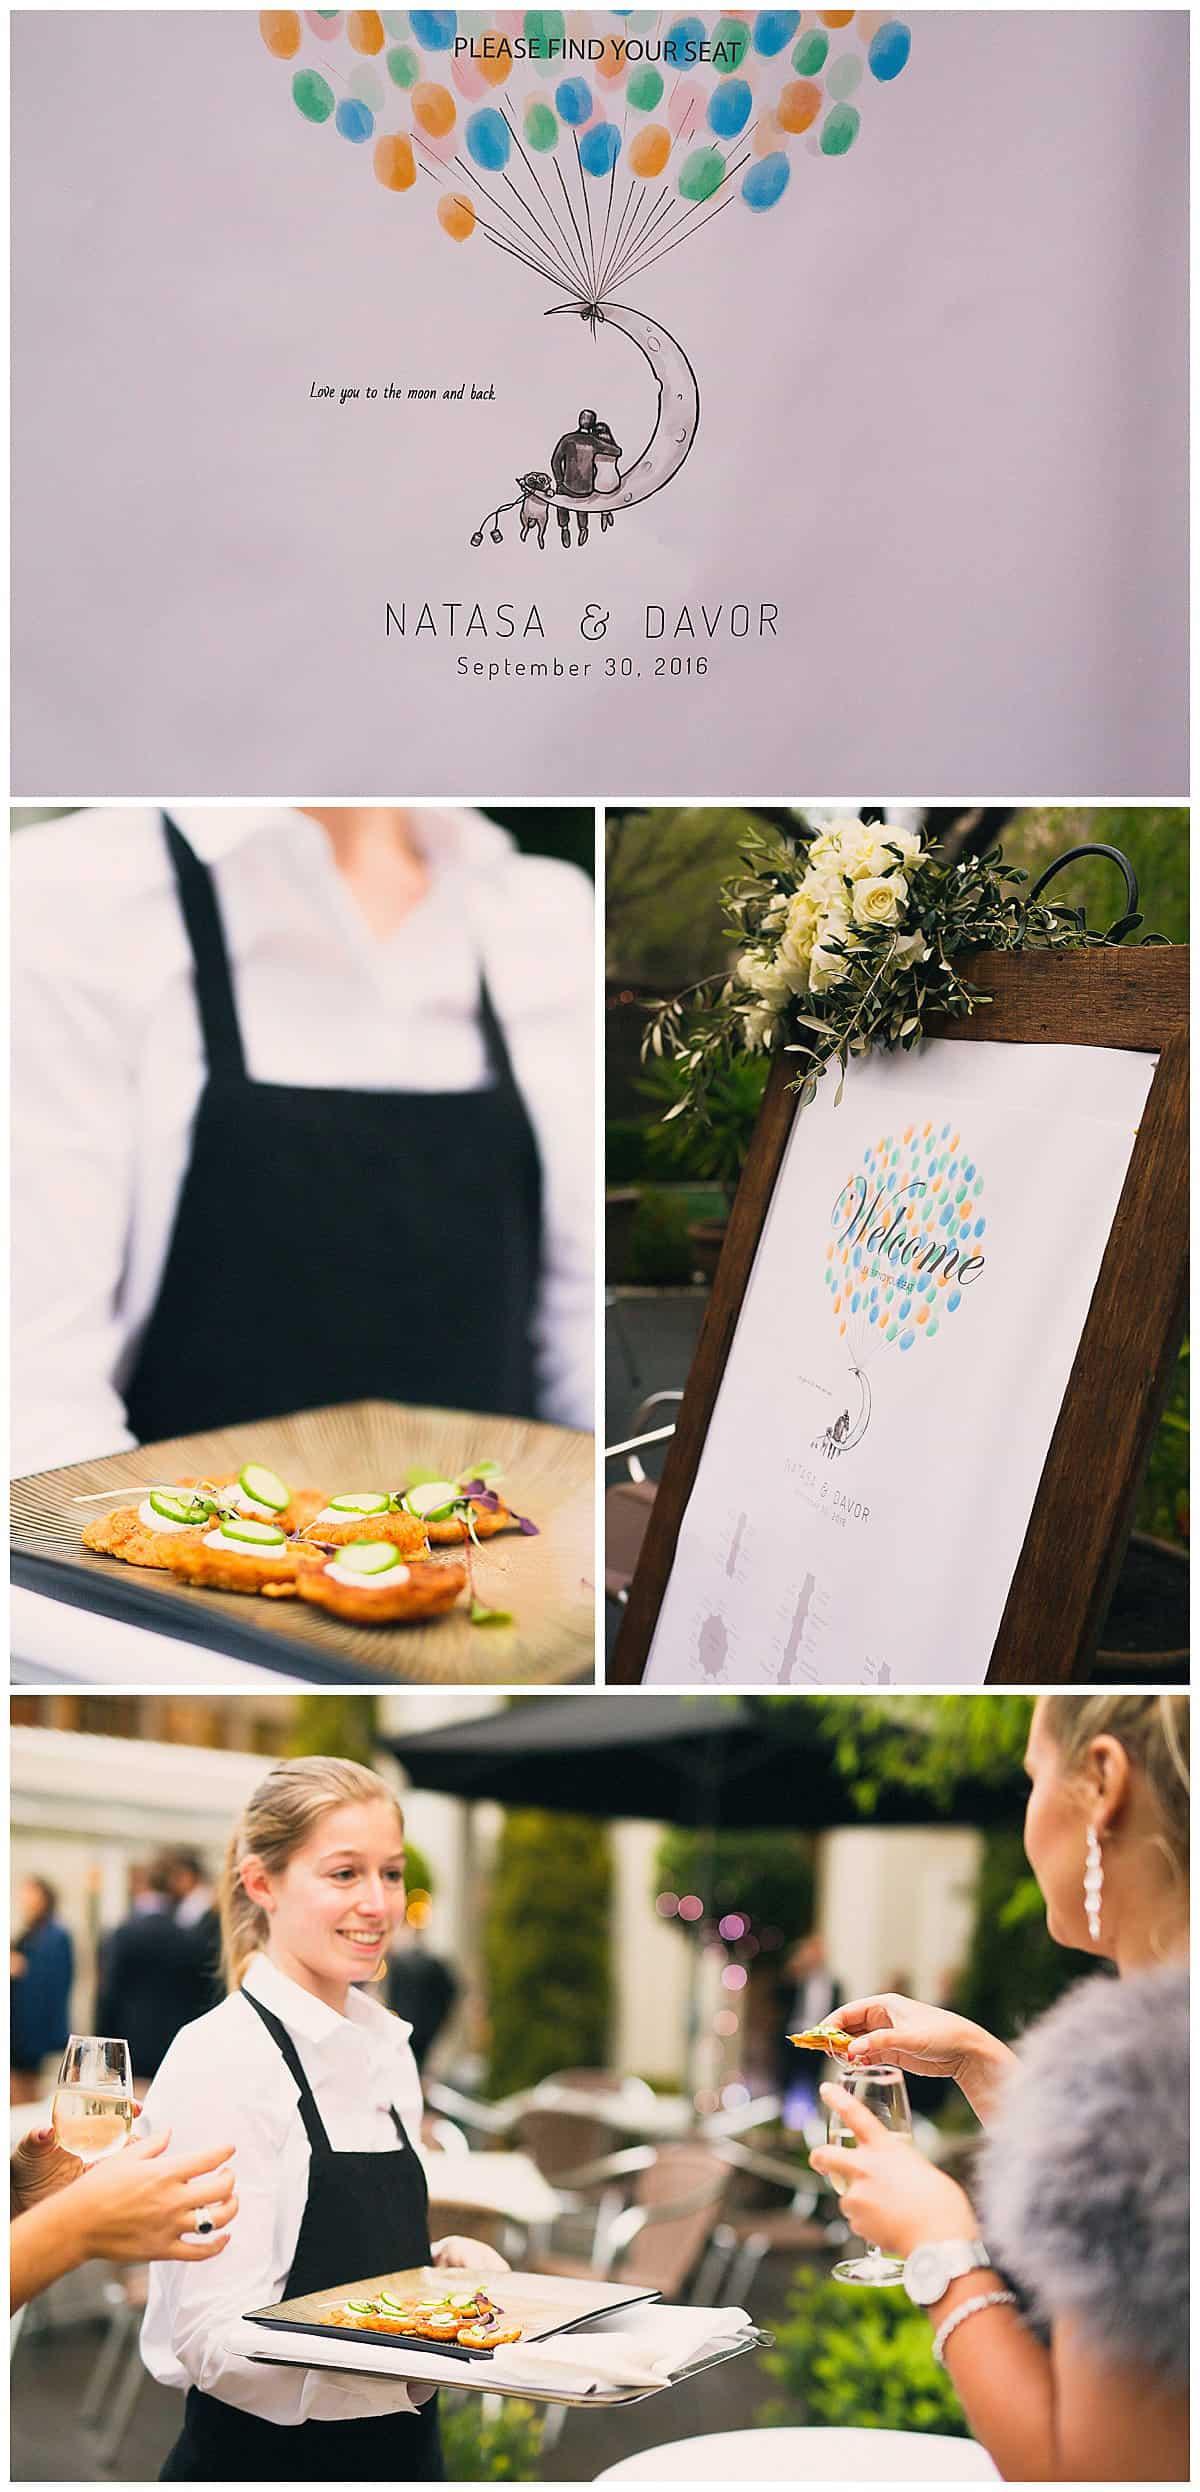 Hacking Creative Wedding Photography - The Willows Wedding Reception, Melbourne